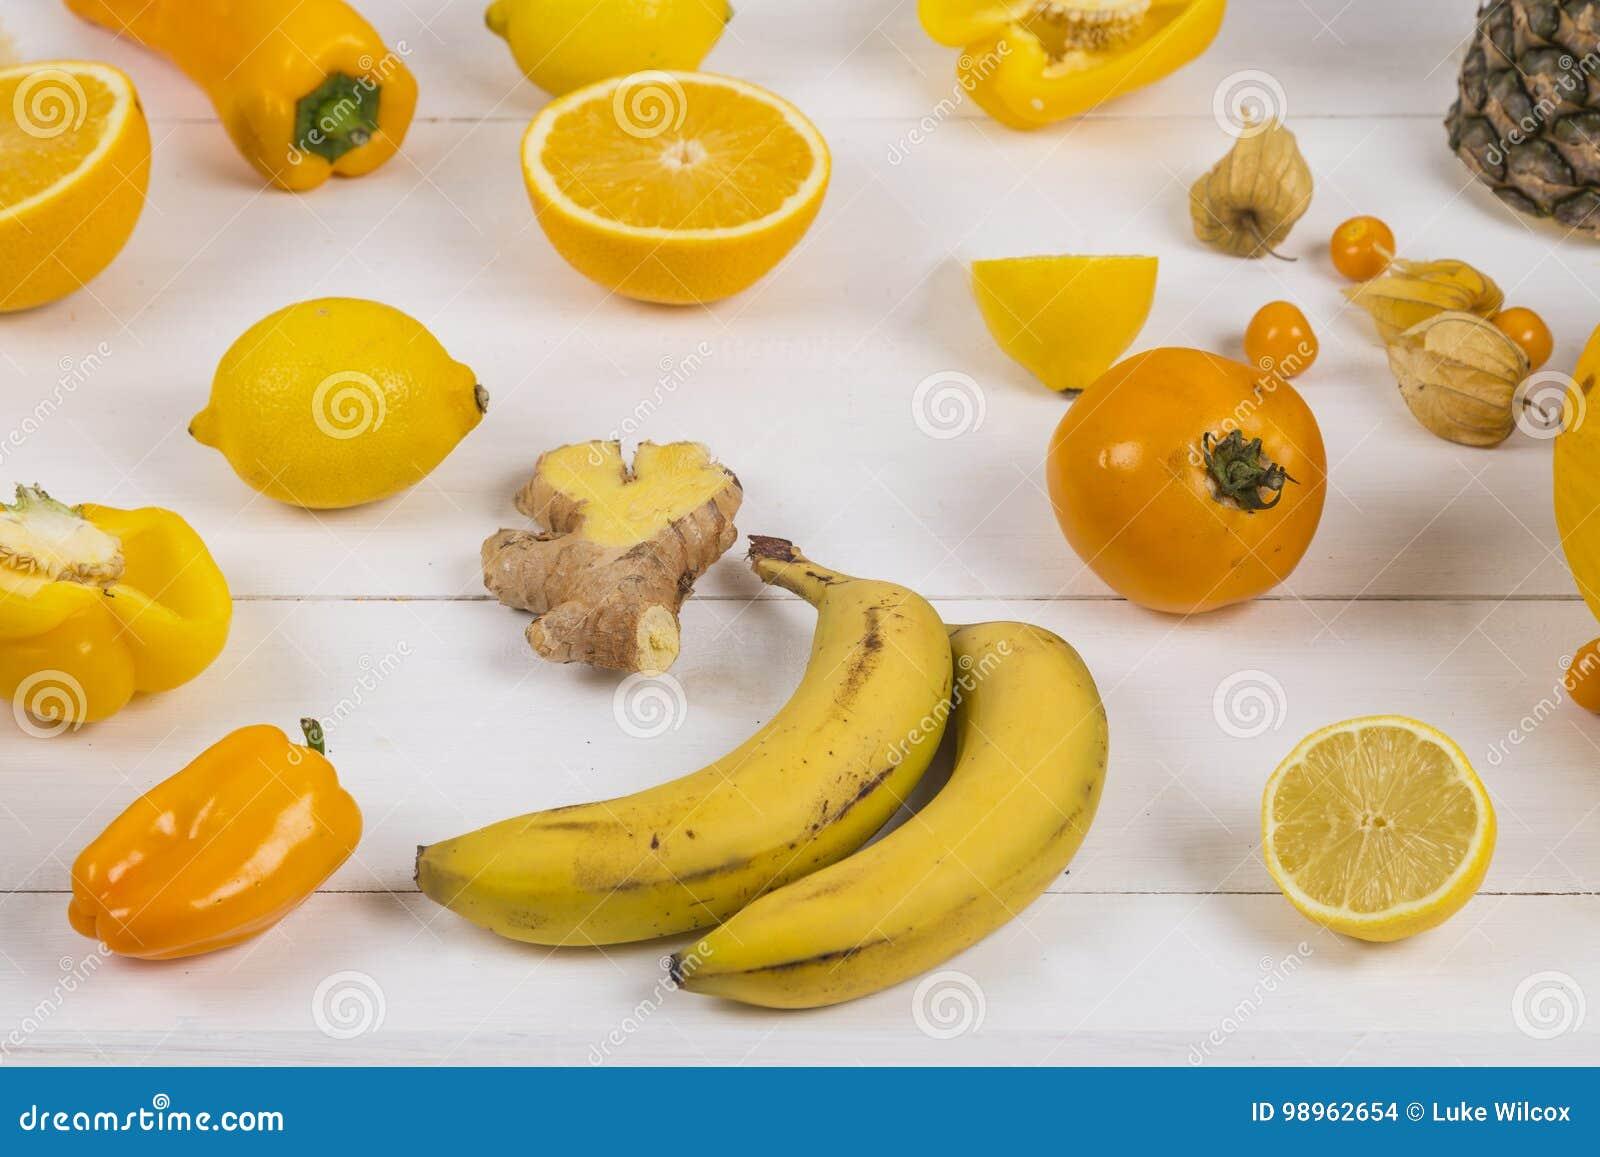 Yellow and orange fruit stock photo. Image of berry ...